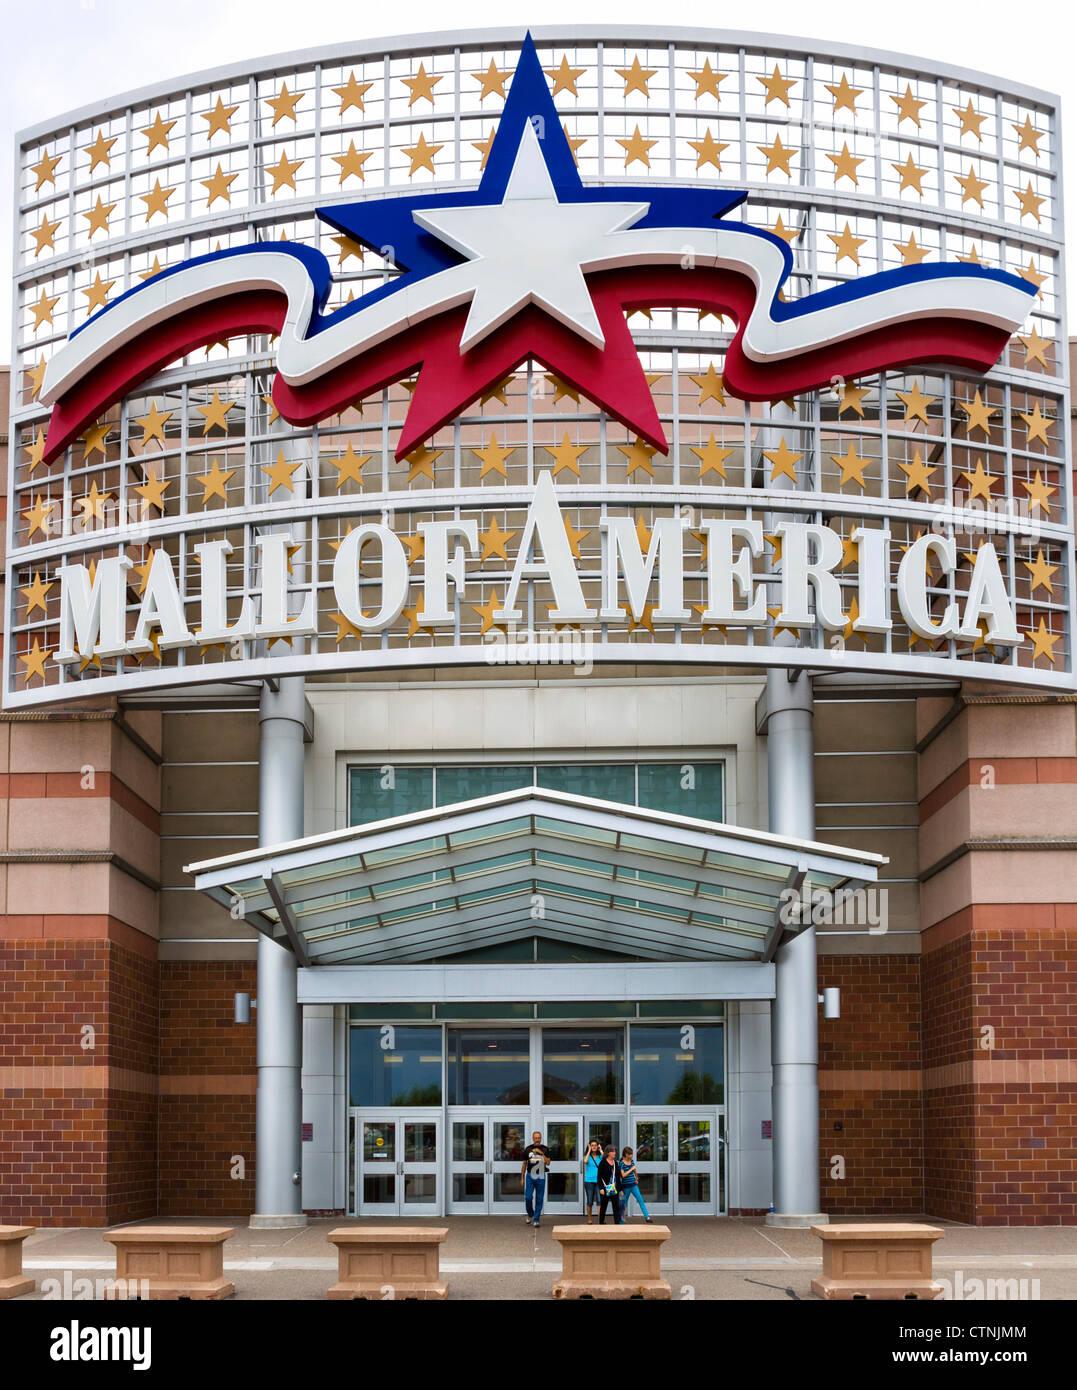 Entrée du centre commercial Mall of America, Minneapolis, Minneapolis, Minnesota, USA Photo Stock